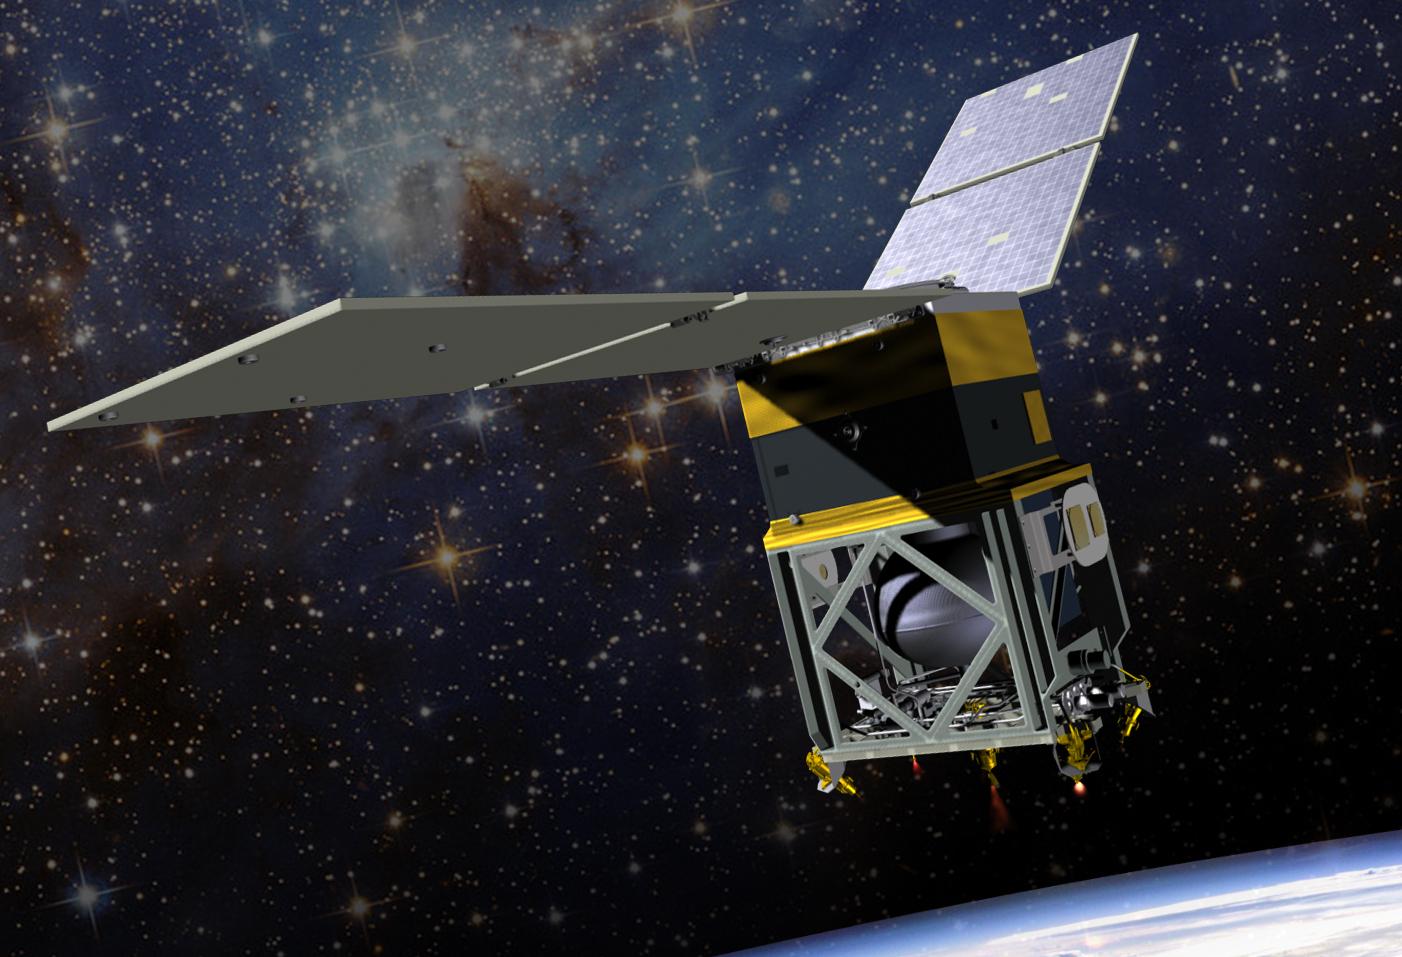 Un propellente verde per i lanci spaziali